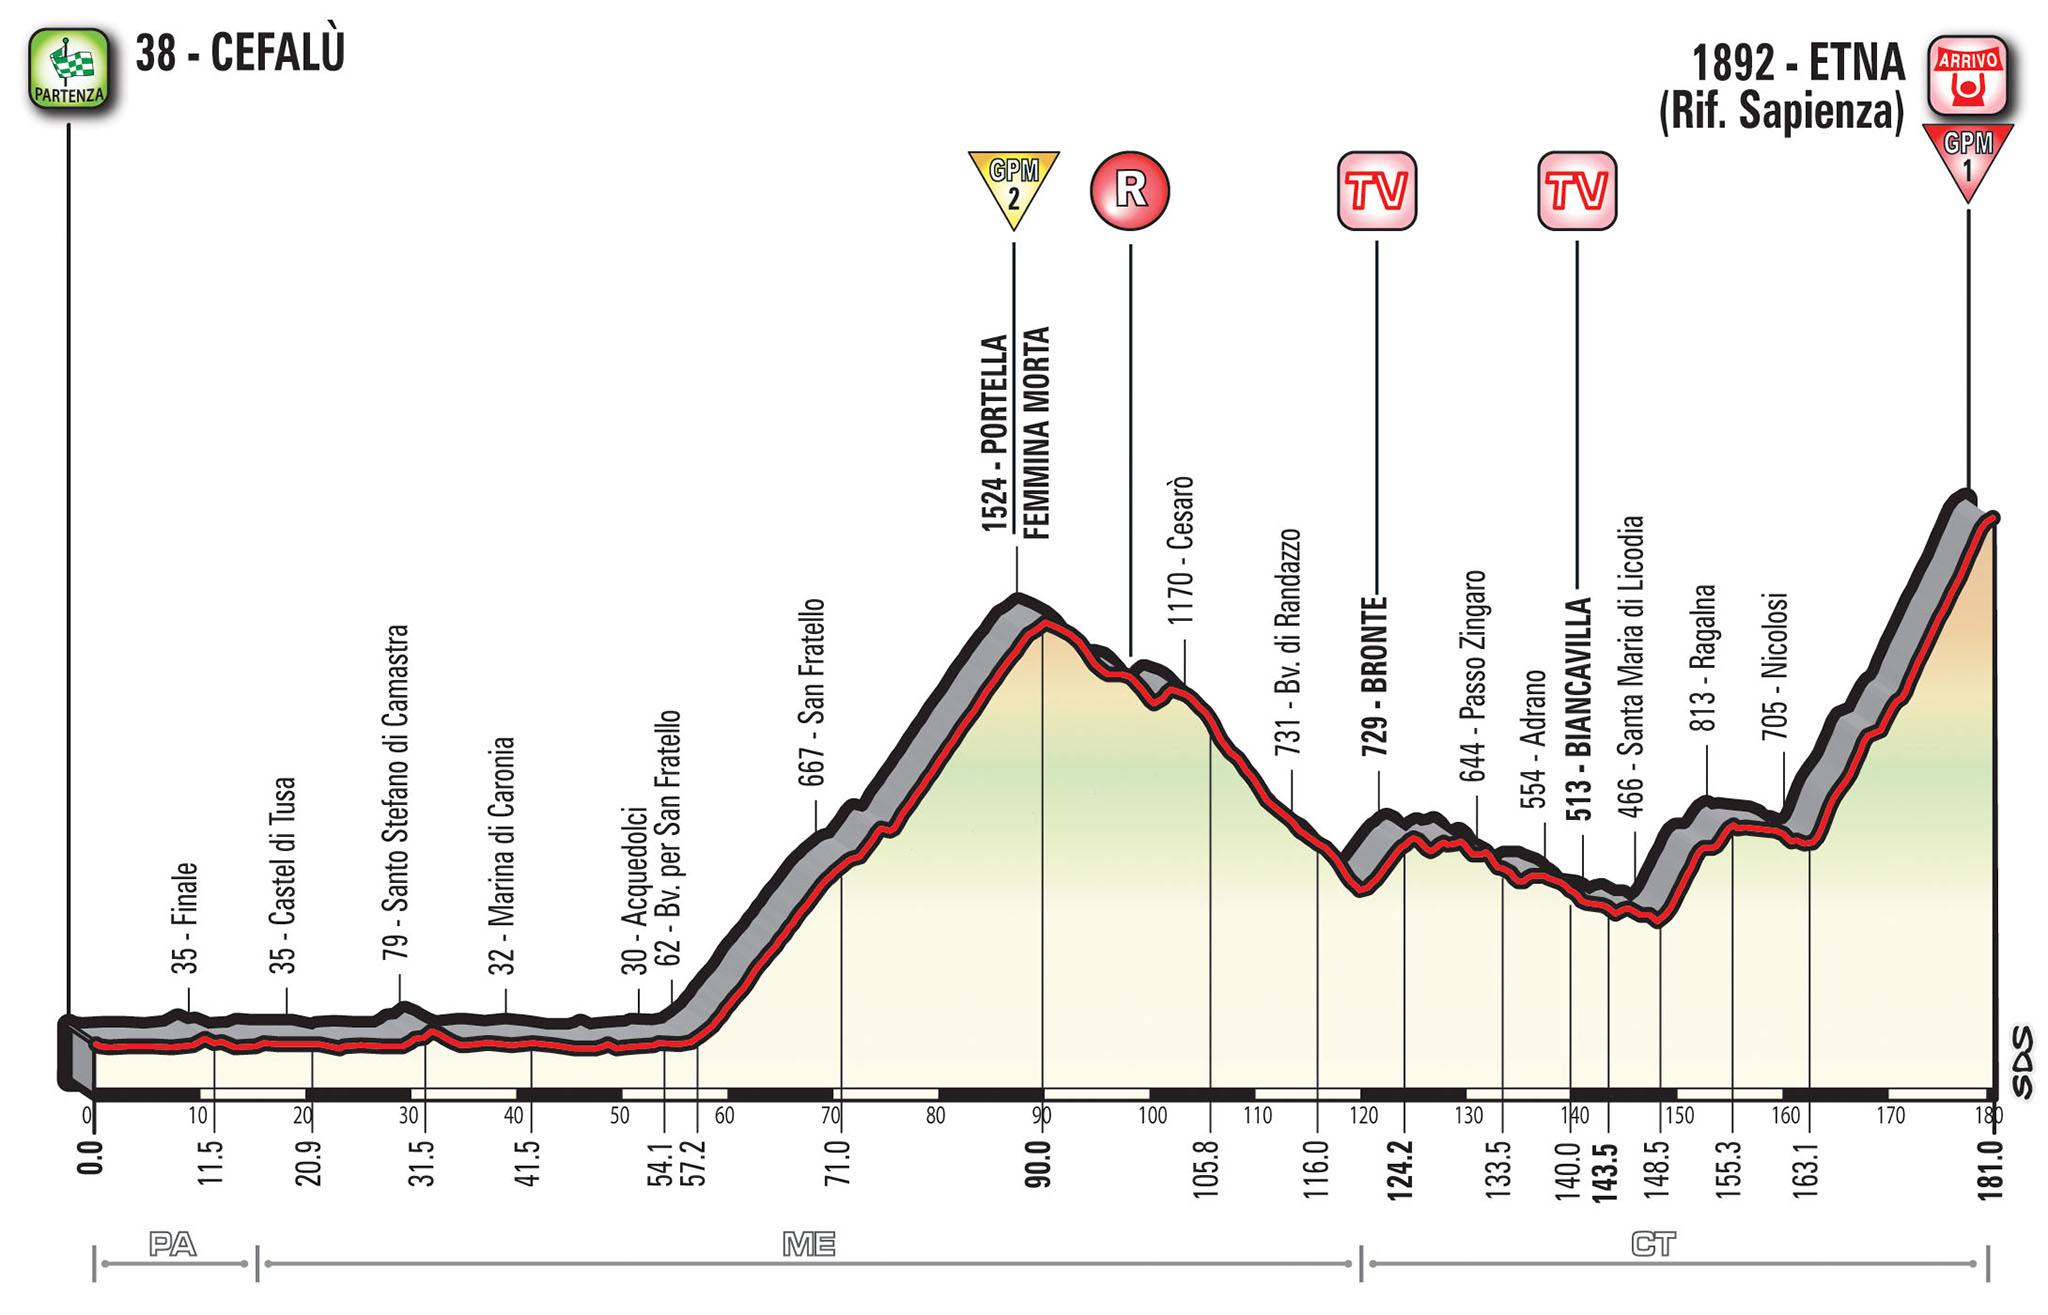 Giro d'Italia 2017: 3° Tappa Cefalù Etna